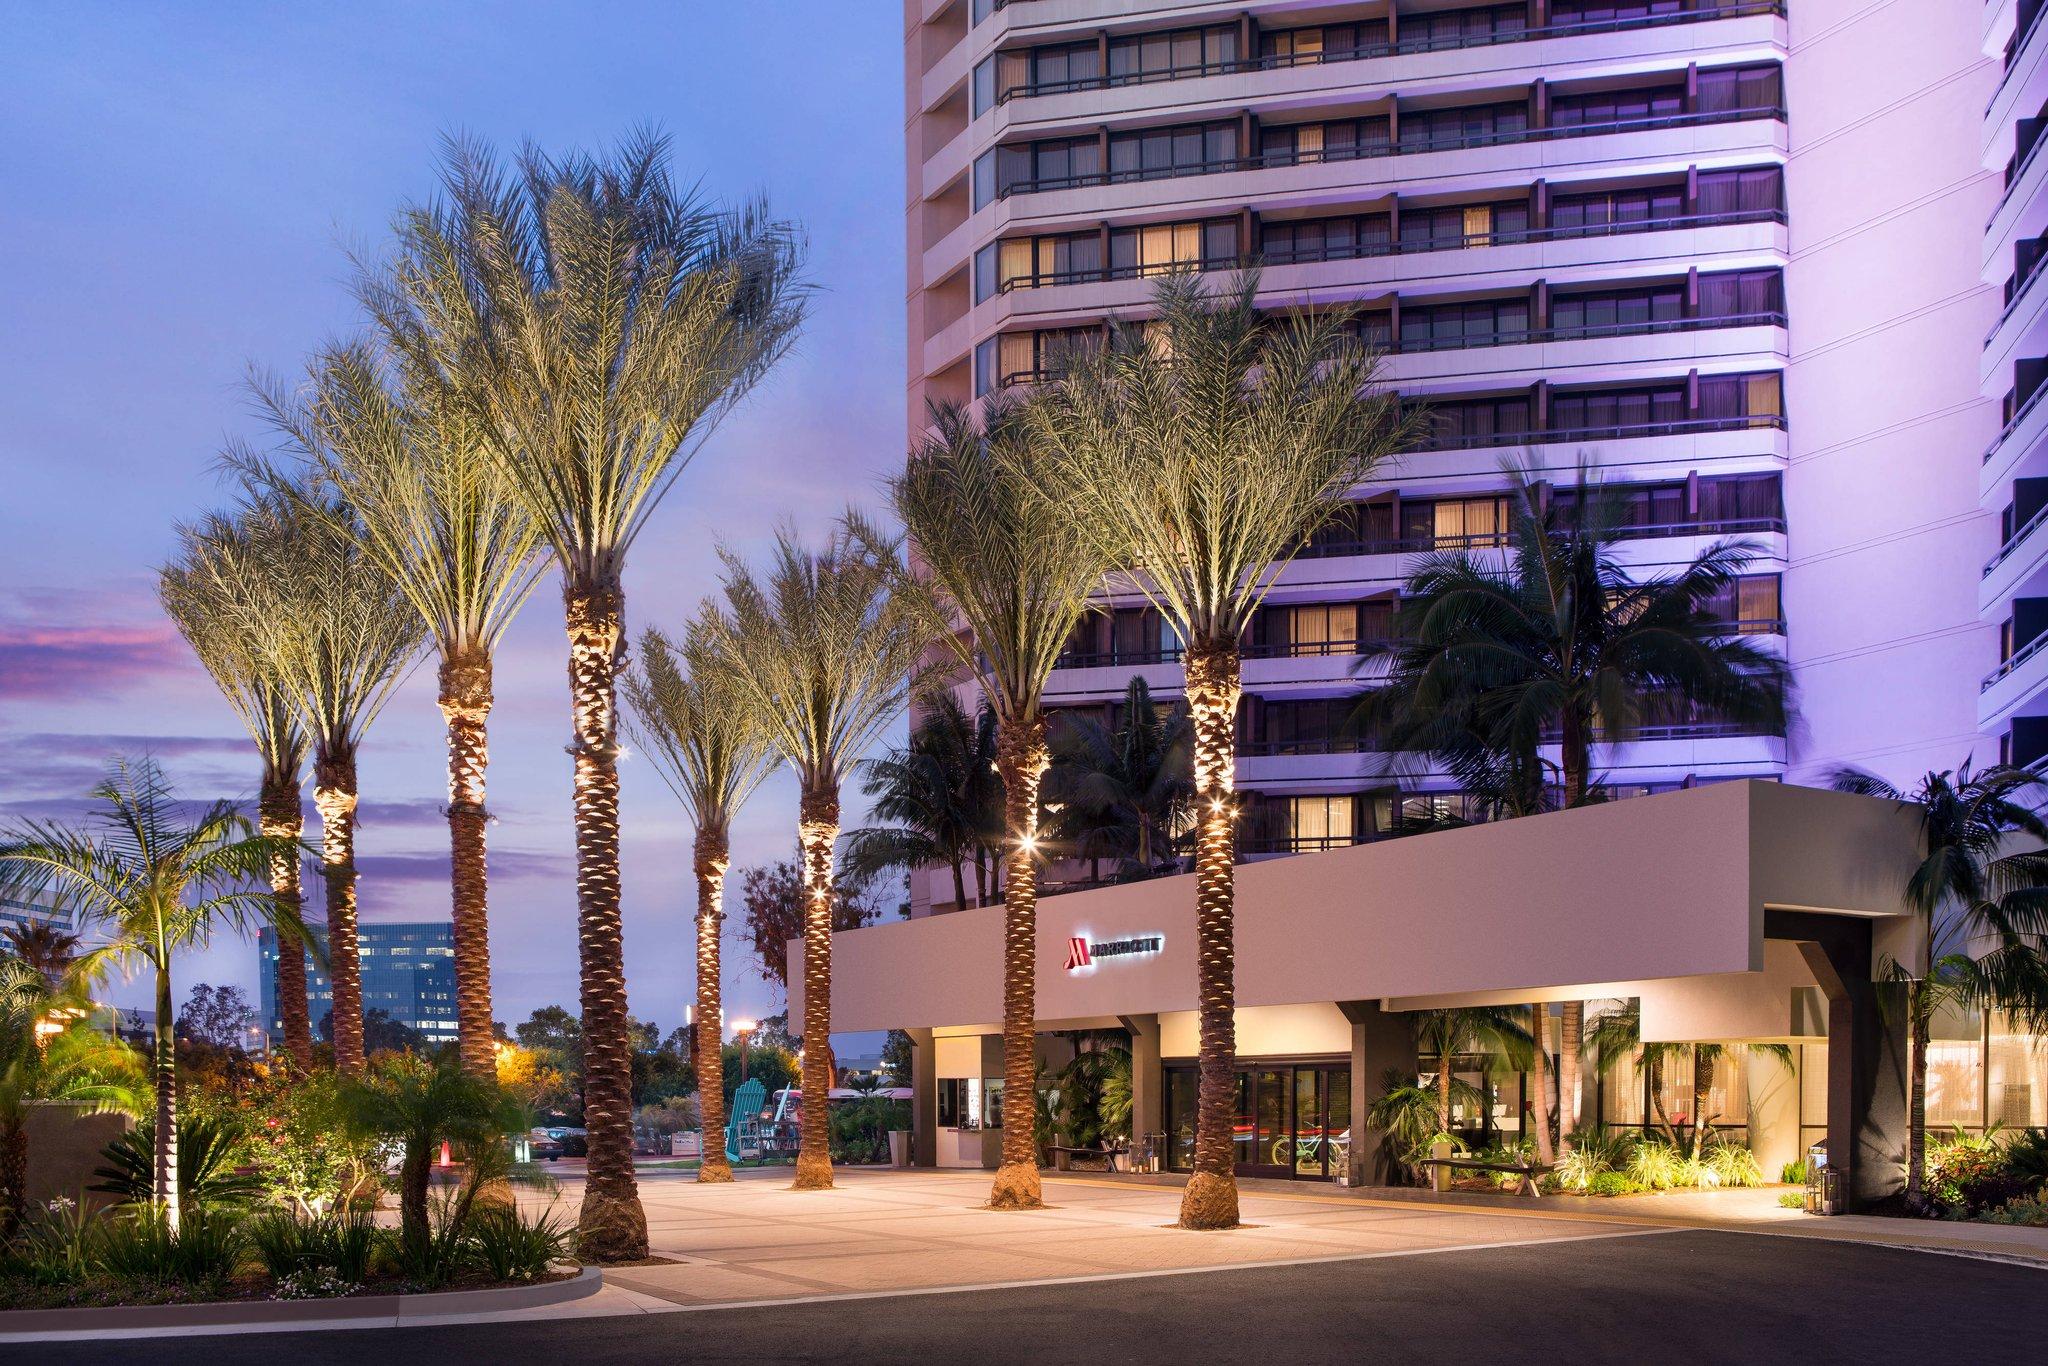 Marriott Hotel Irvine